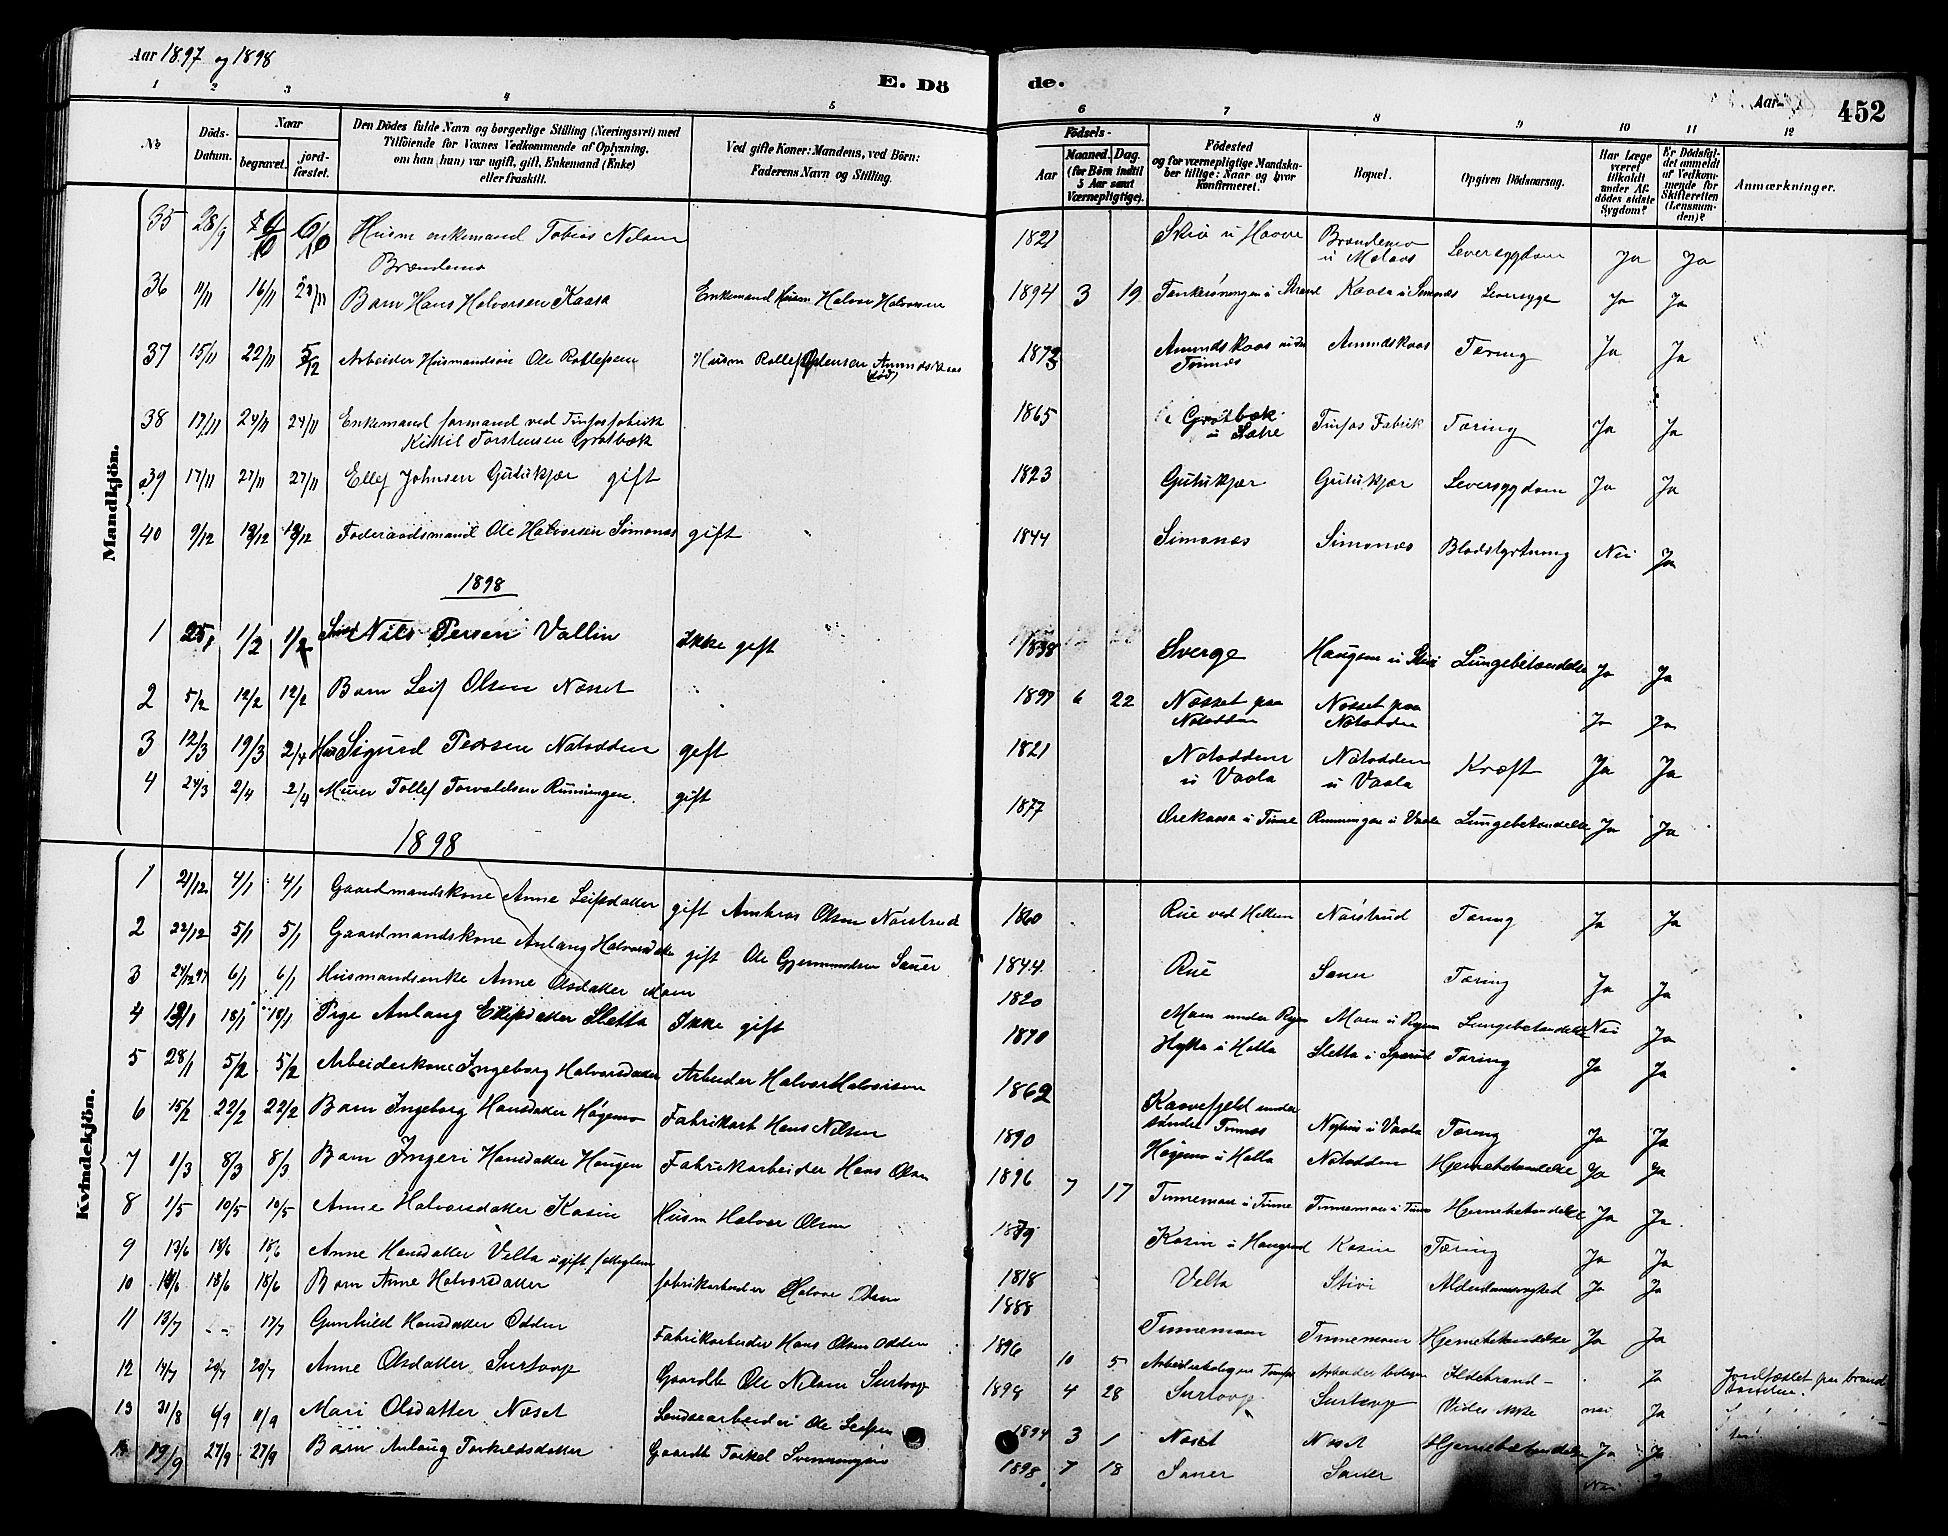 SAKO, Heddal kirkebøker, G/Ga/L0002: Klokkerbok nr. I 2, 1879-1908, s. 452